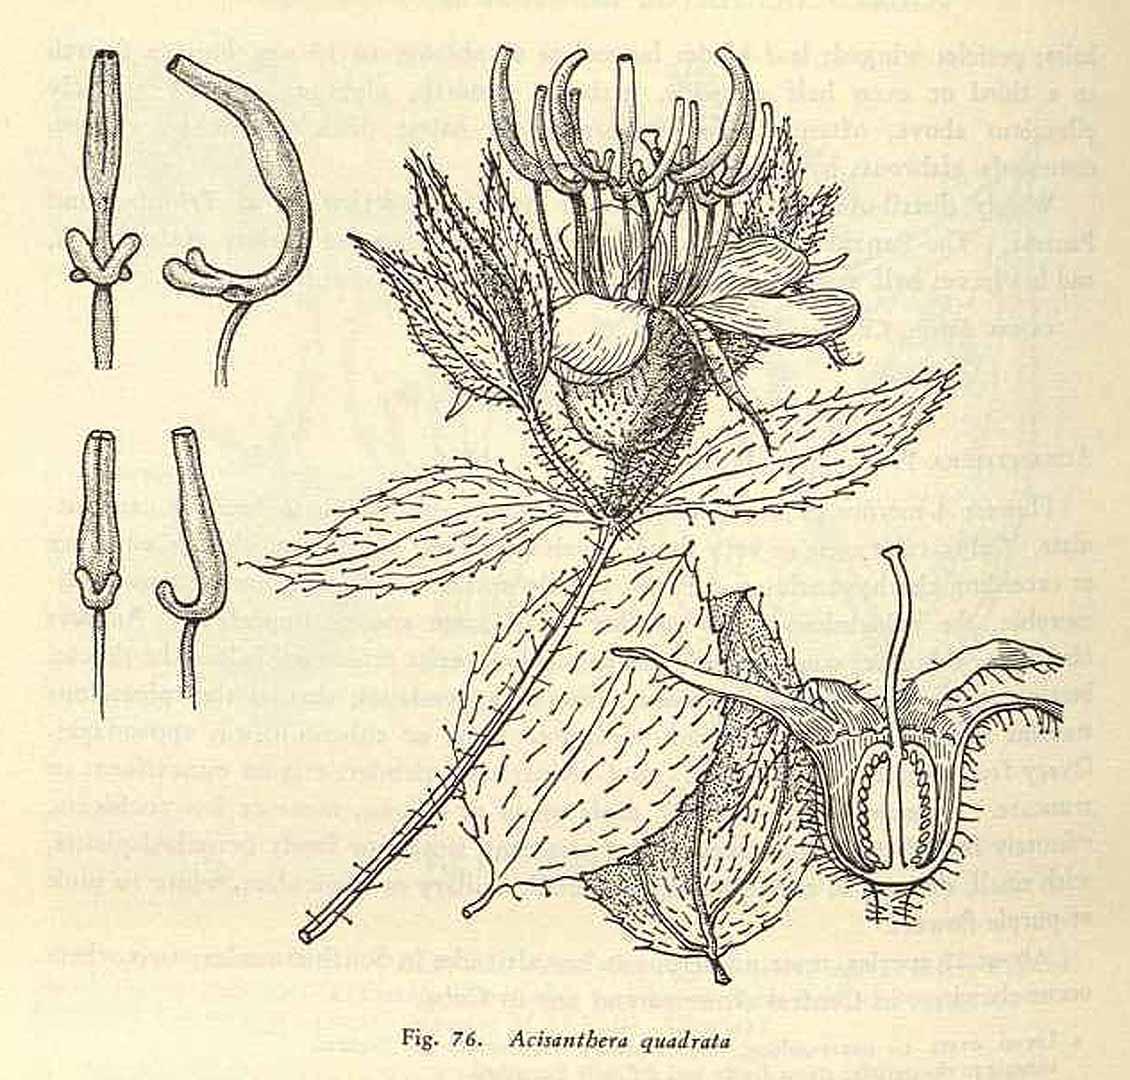 Acisanthera quadrata